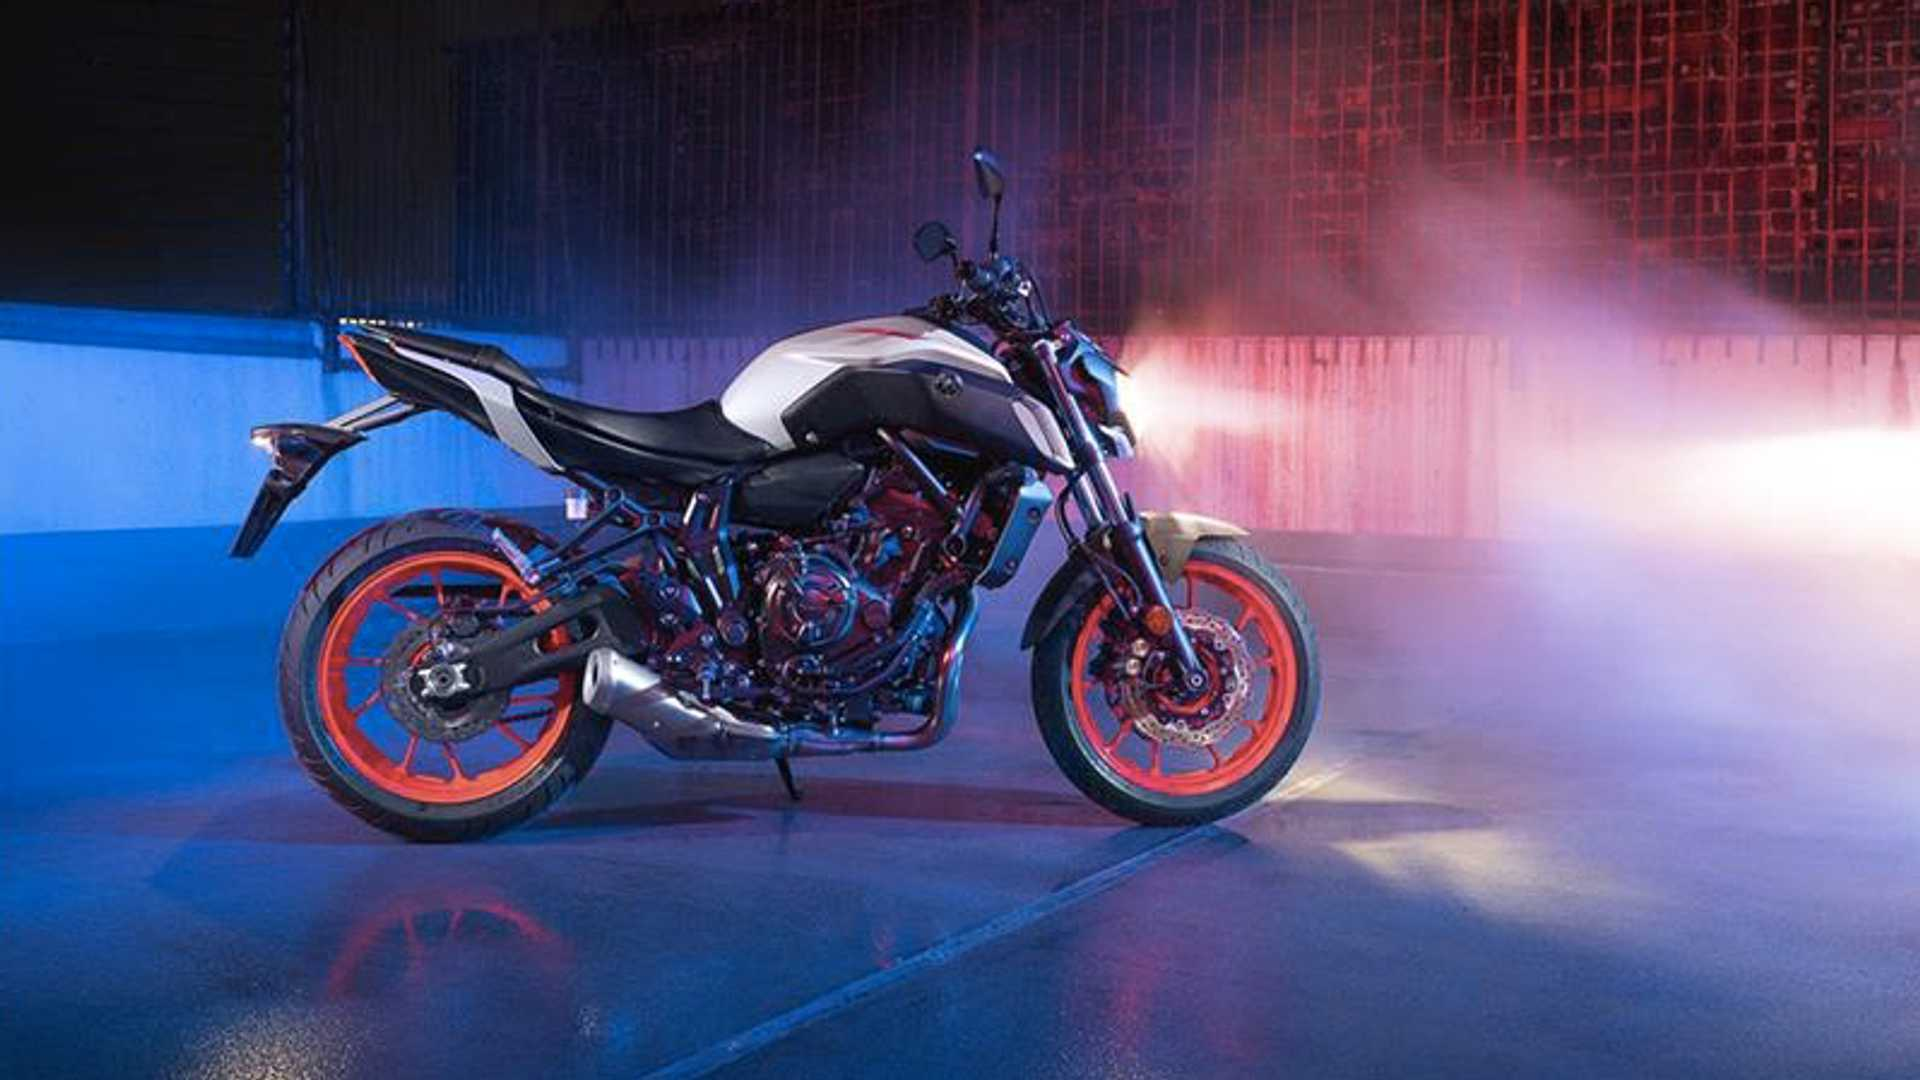 2019 Yamaha MT-07 | RideApart Photos